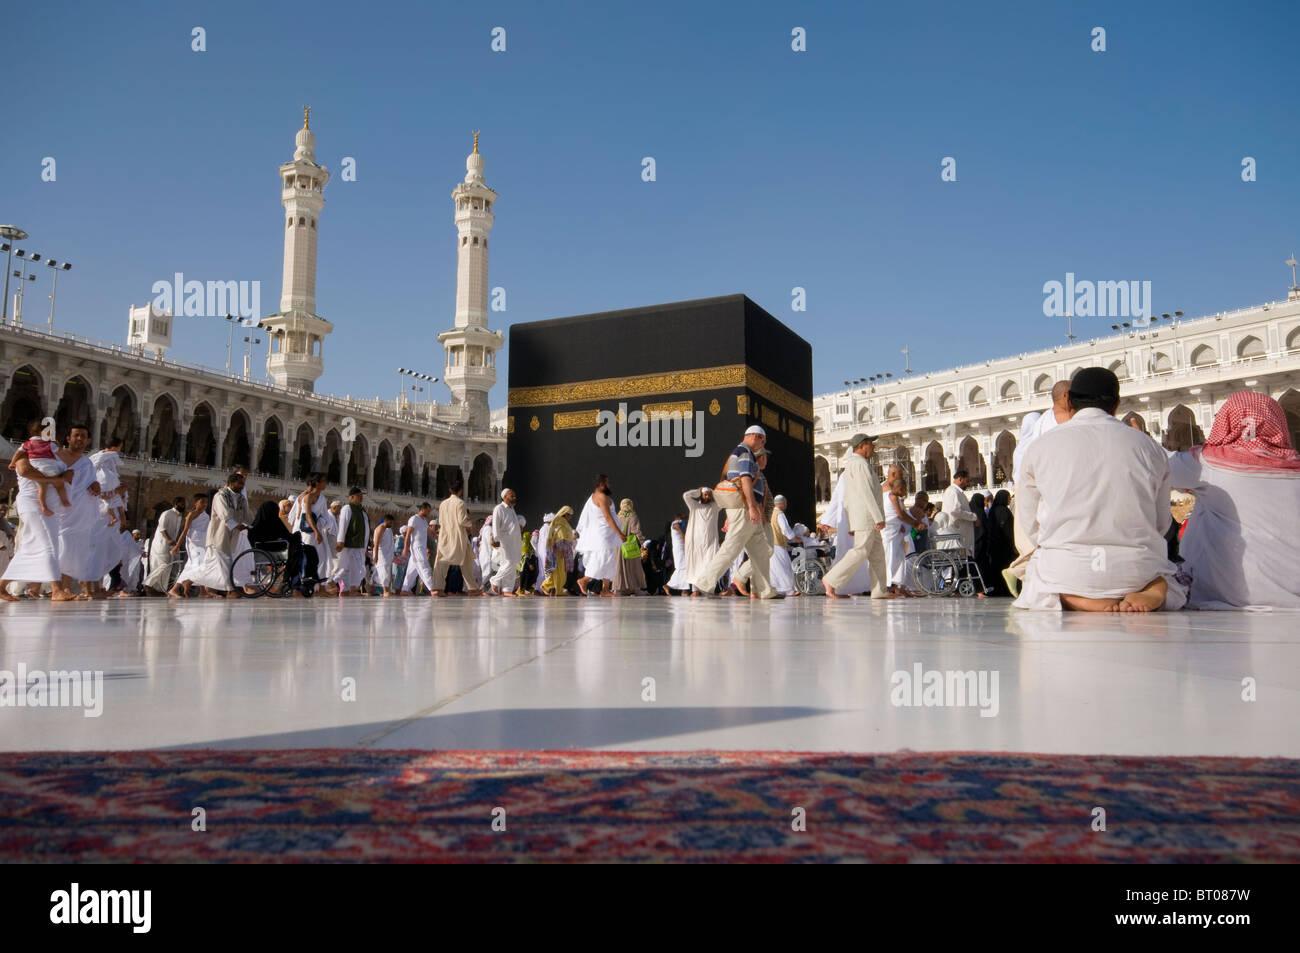 pilgrims circumambulate the kaaba at masjidil haram on april 23